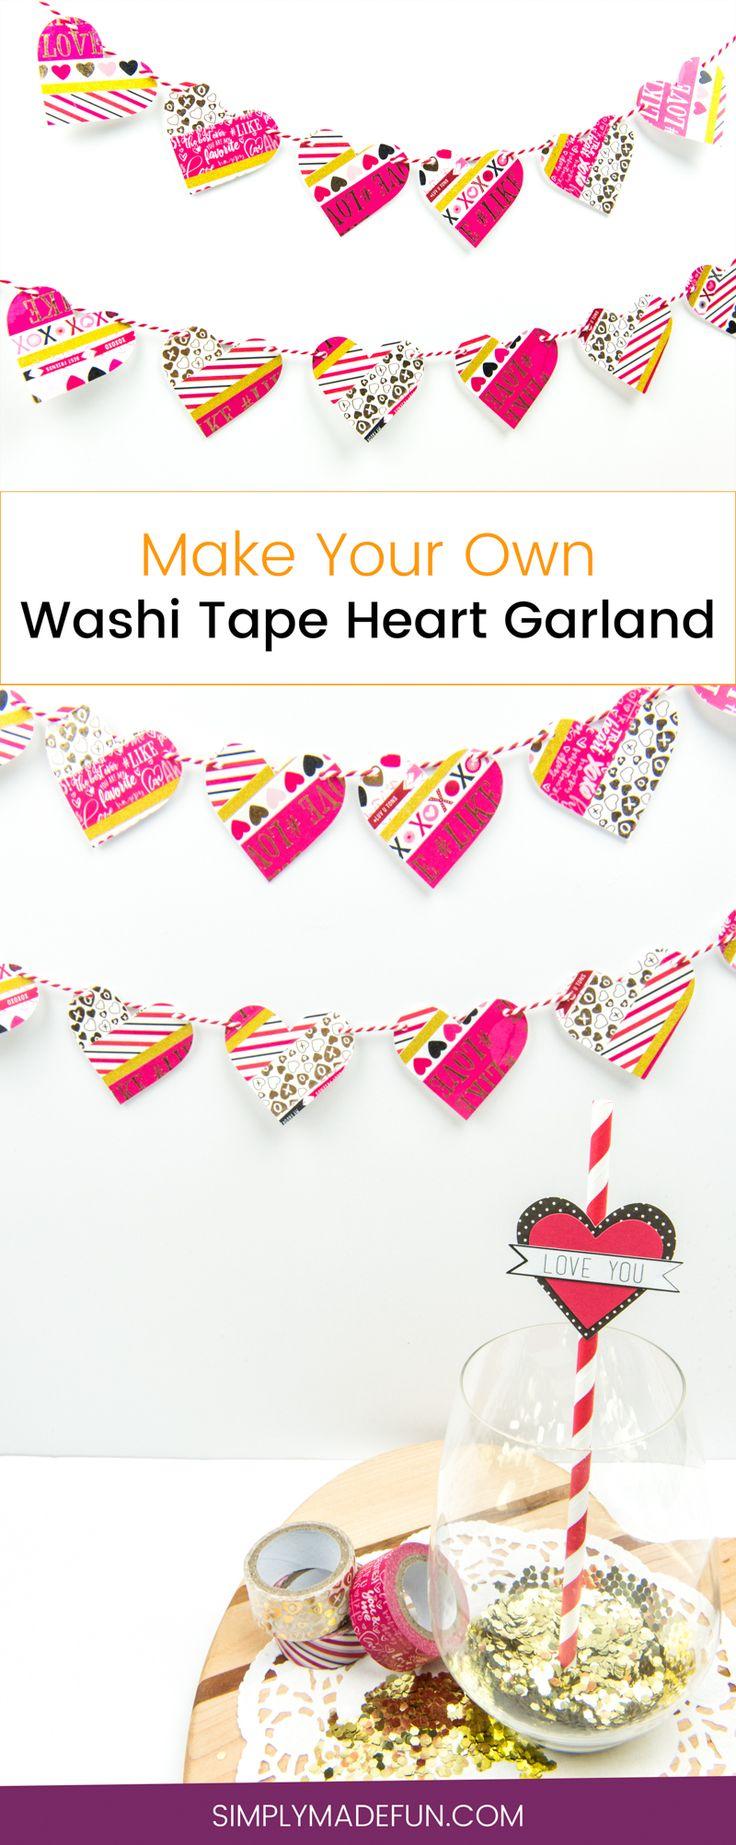 213 Best Valentineu0027s Day Crafts U0026 DIY Images On Pinterest | Valentine  Party, Valentine Ideas And DIY